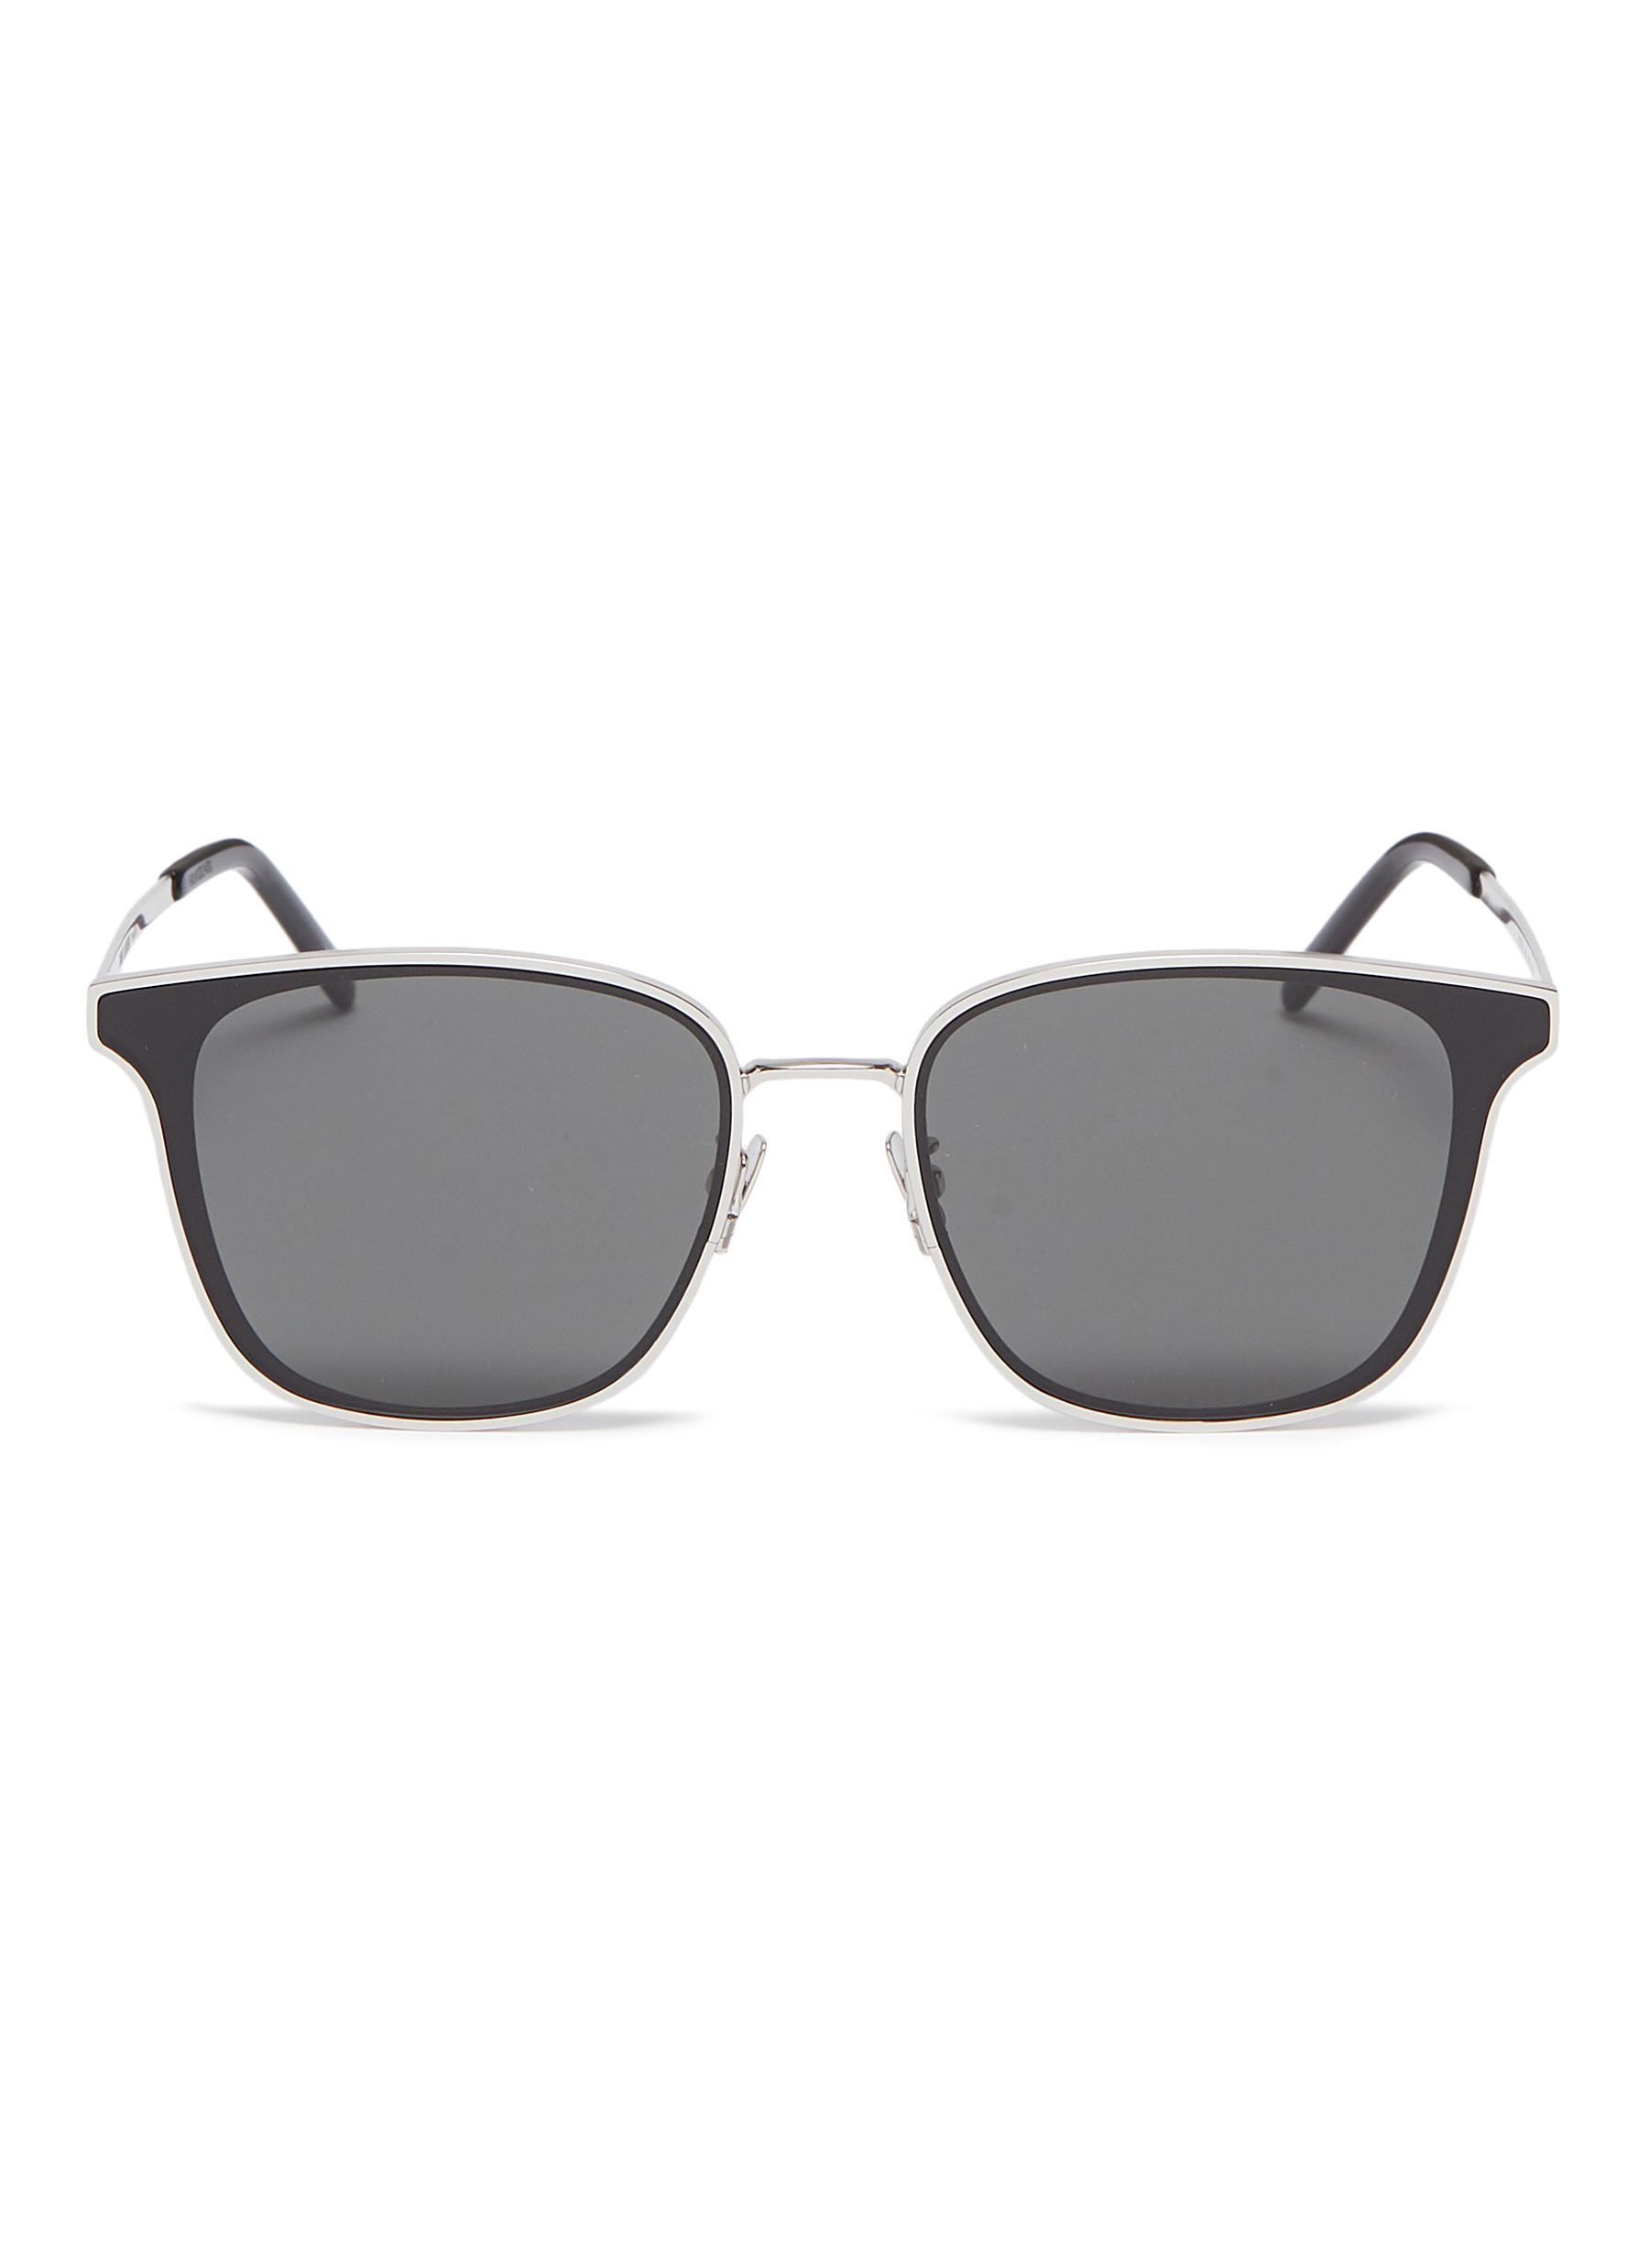 fa730978b2f5 SAINT LAURENT | Metal frame square sunglasses | Men | Lane Crawford